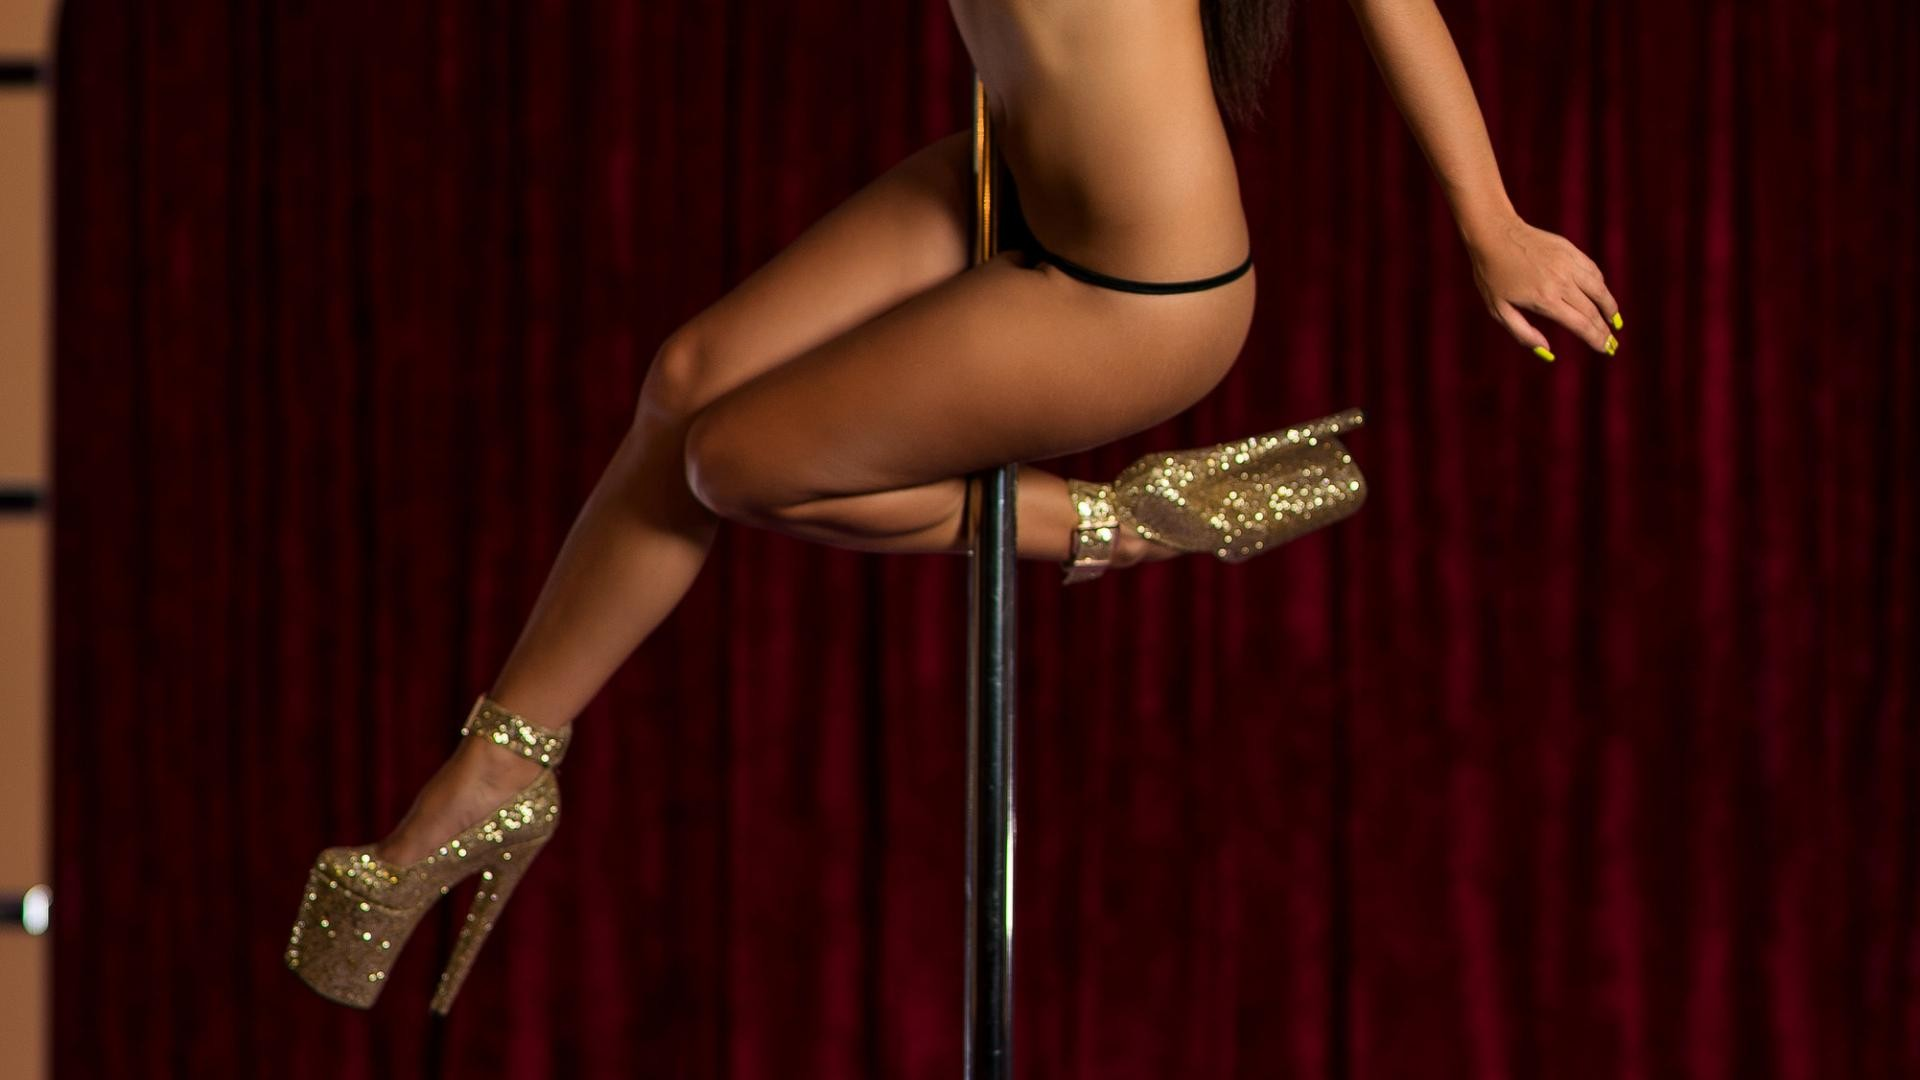 Lap dance on strip show club